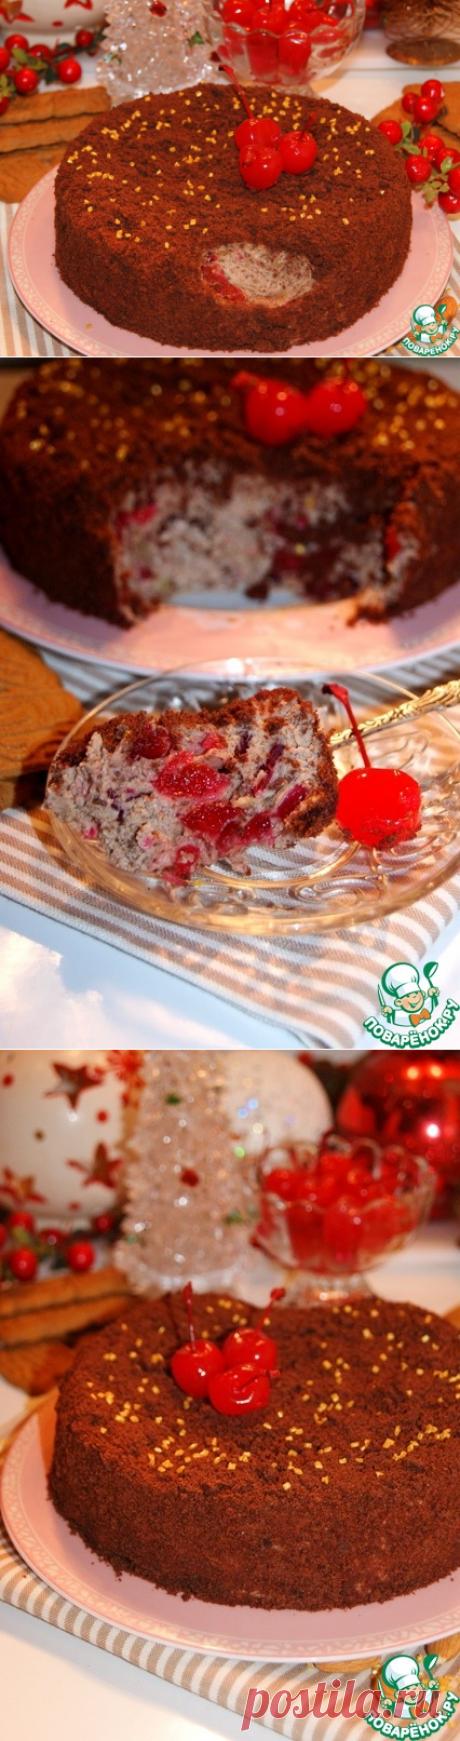 Шварцвальдский паштет – кулинарный рецепт